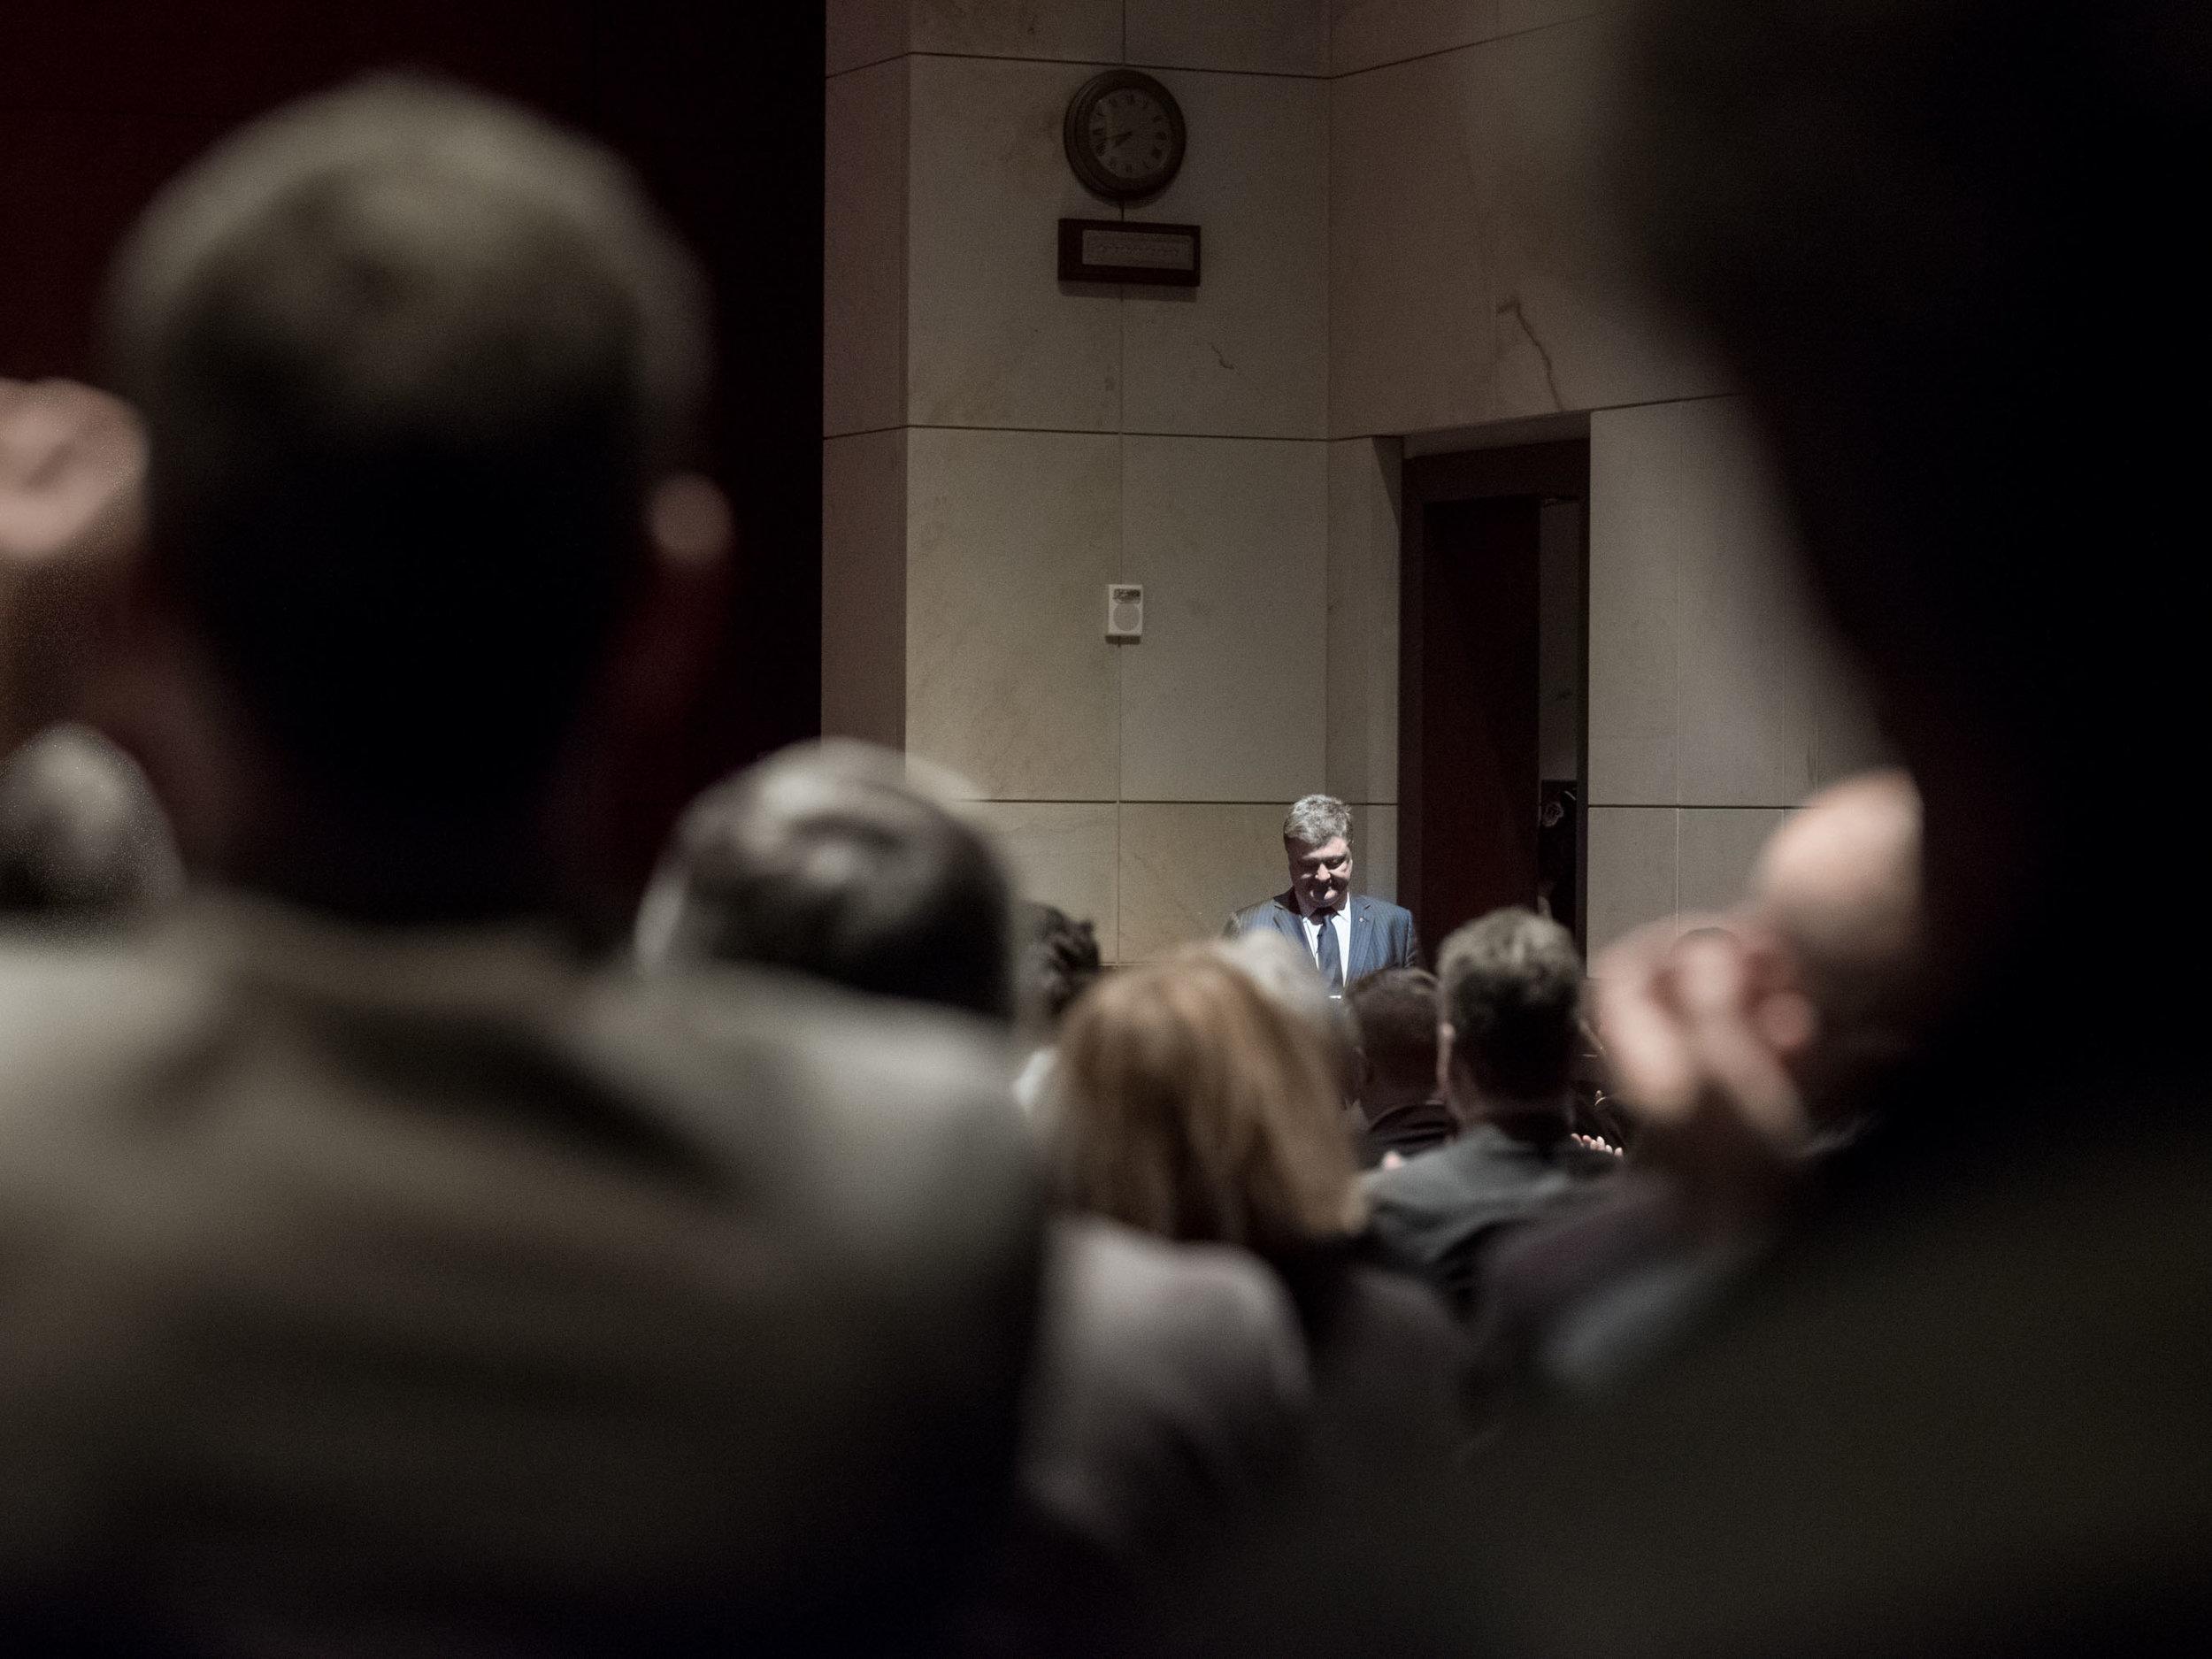 poroshenko+zelensky+ukraine+event+photography+photographer+washington+dc+vadym+guliuk+president-1.jpg